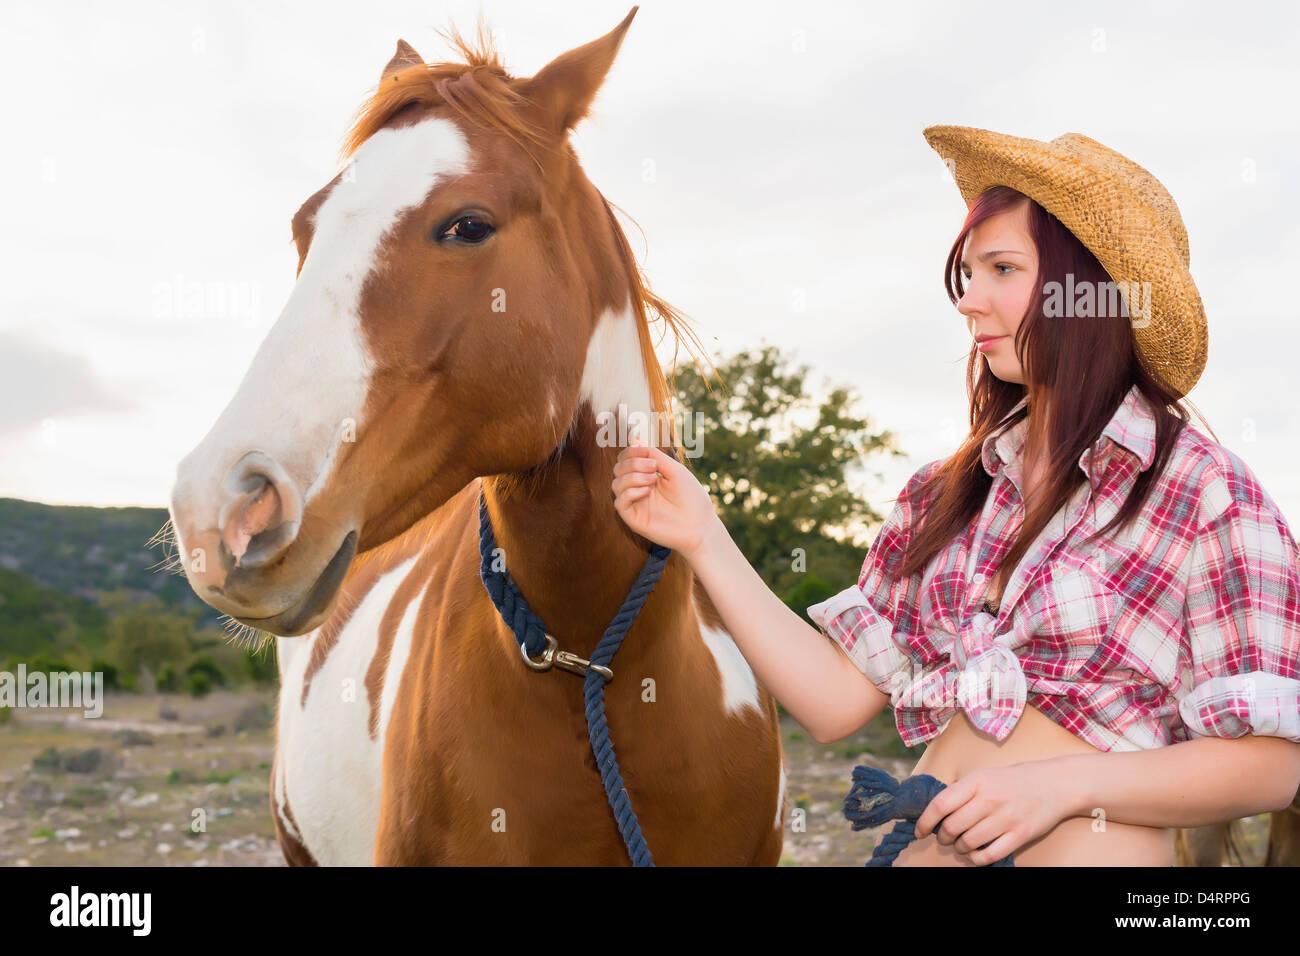 Female teenager petting a horse, Female 19 Caucasian - Stock Image